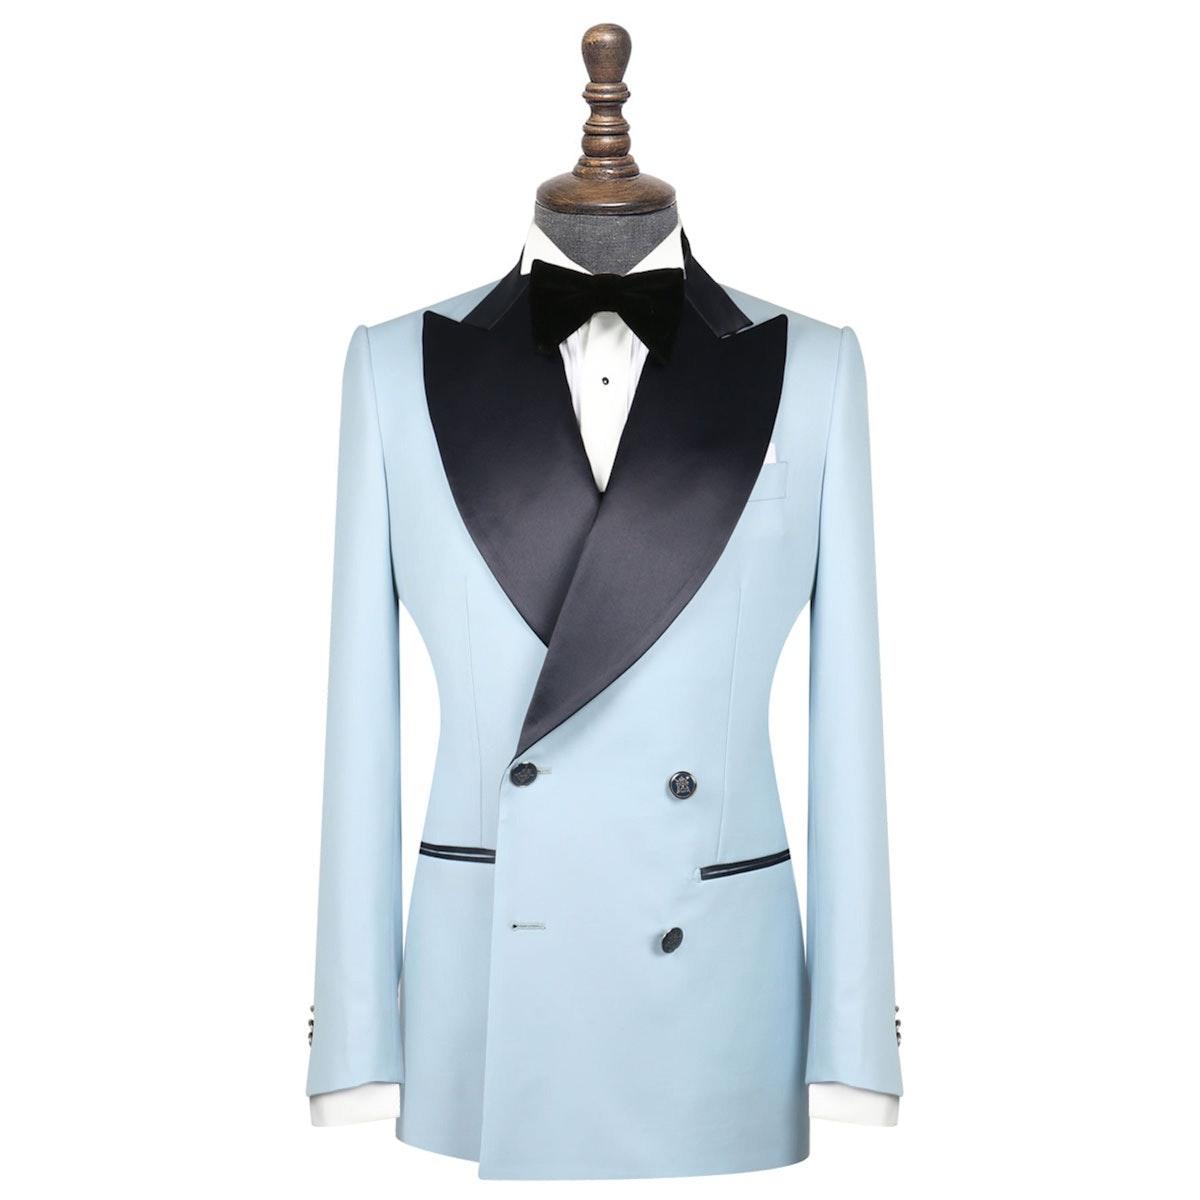 InStitchu Collection The Ballotelli Light Blue and Navy Wool Tuxedo Jacket